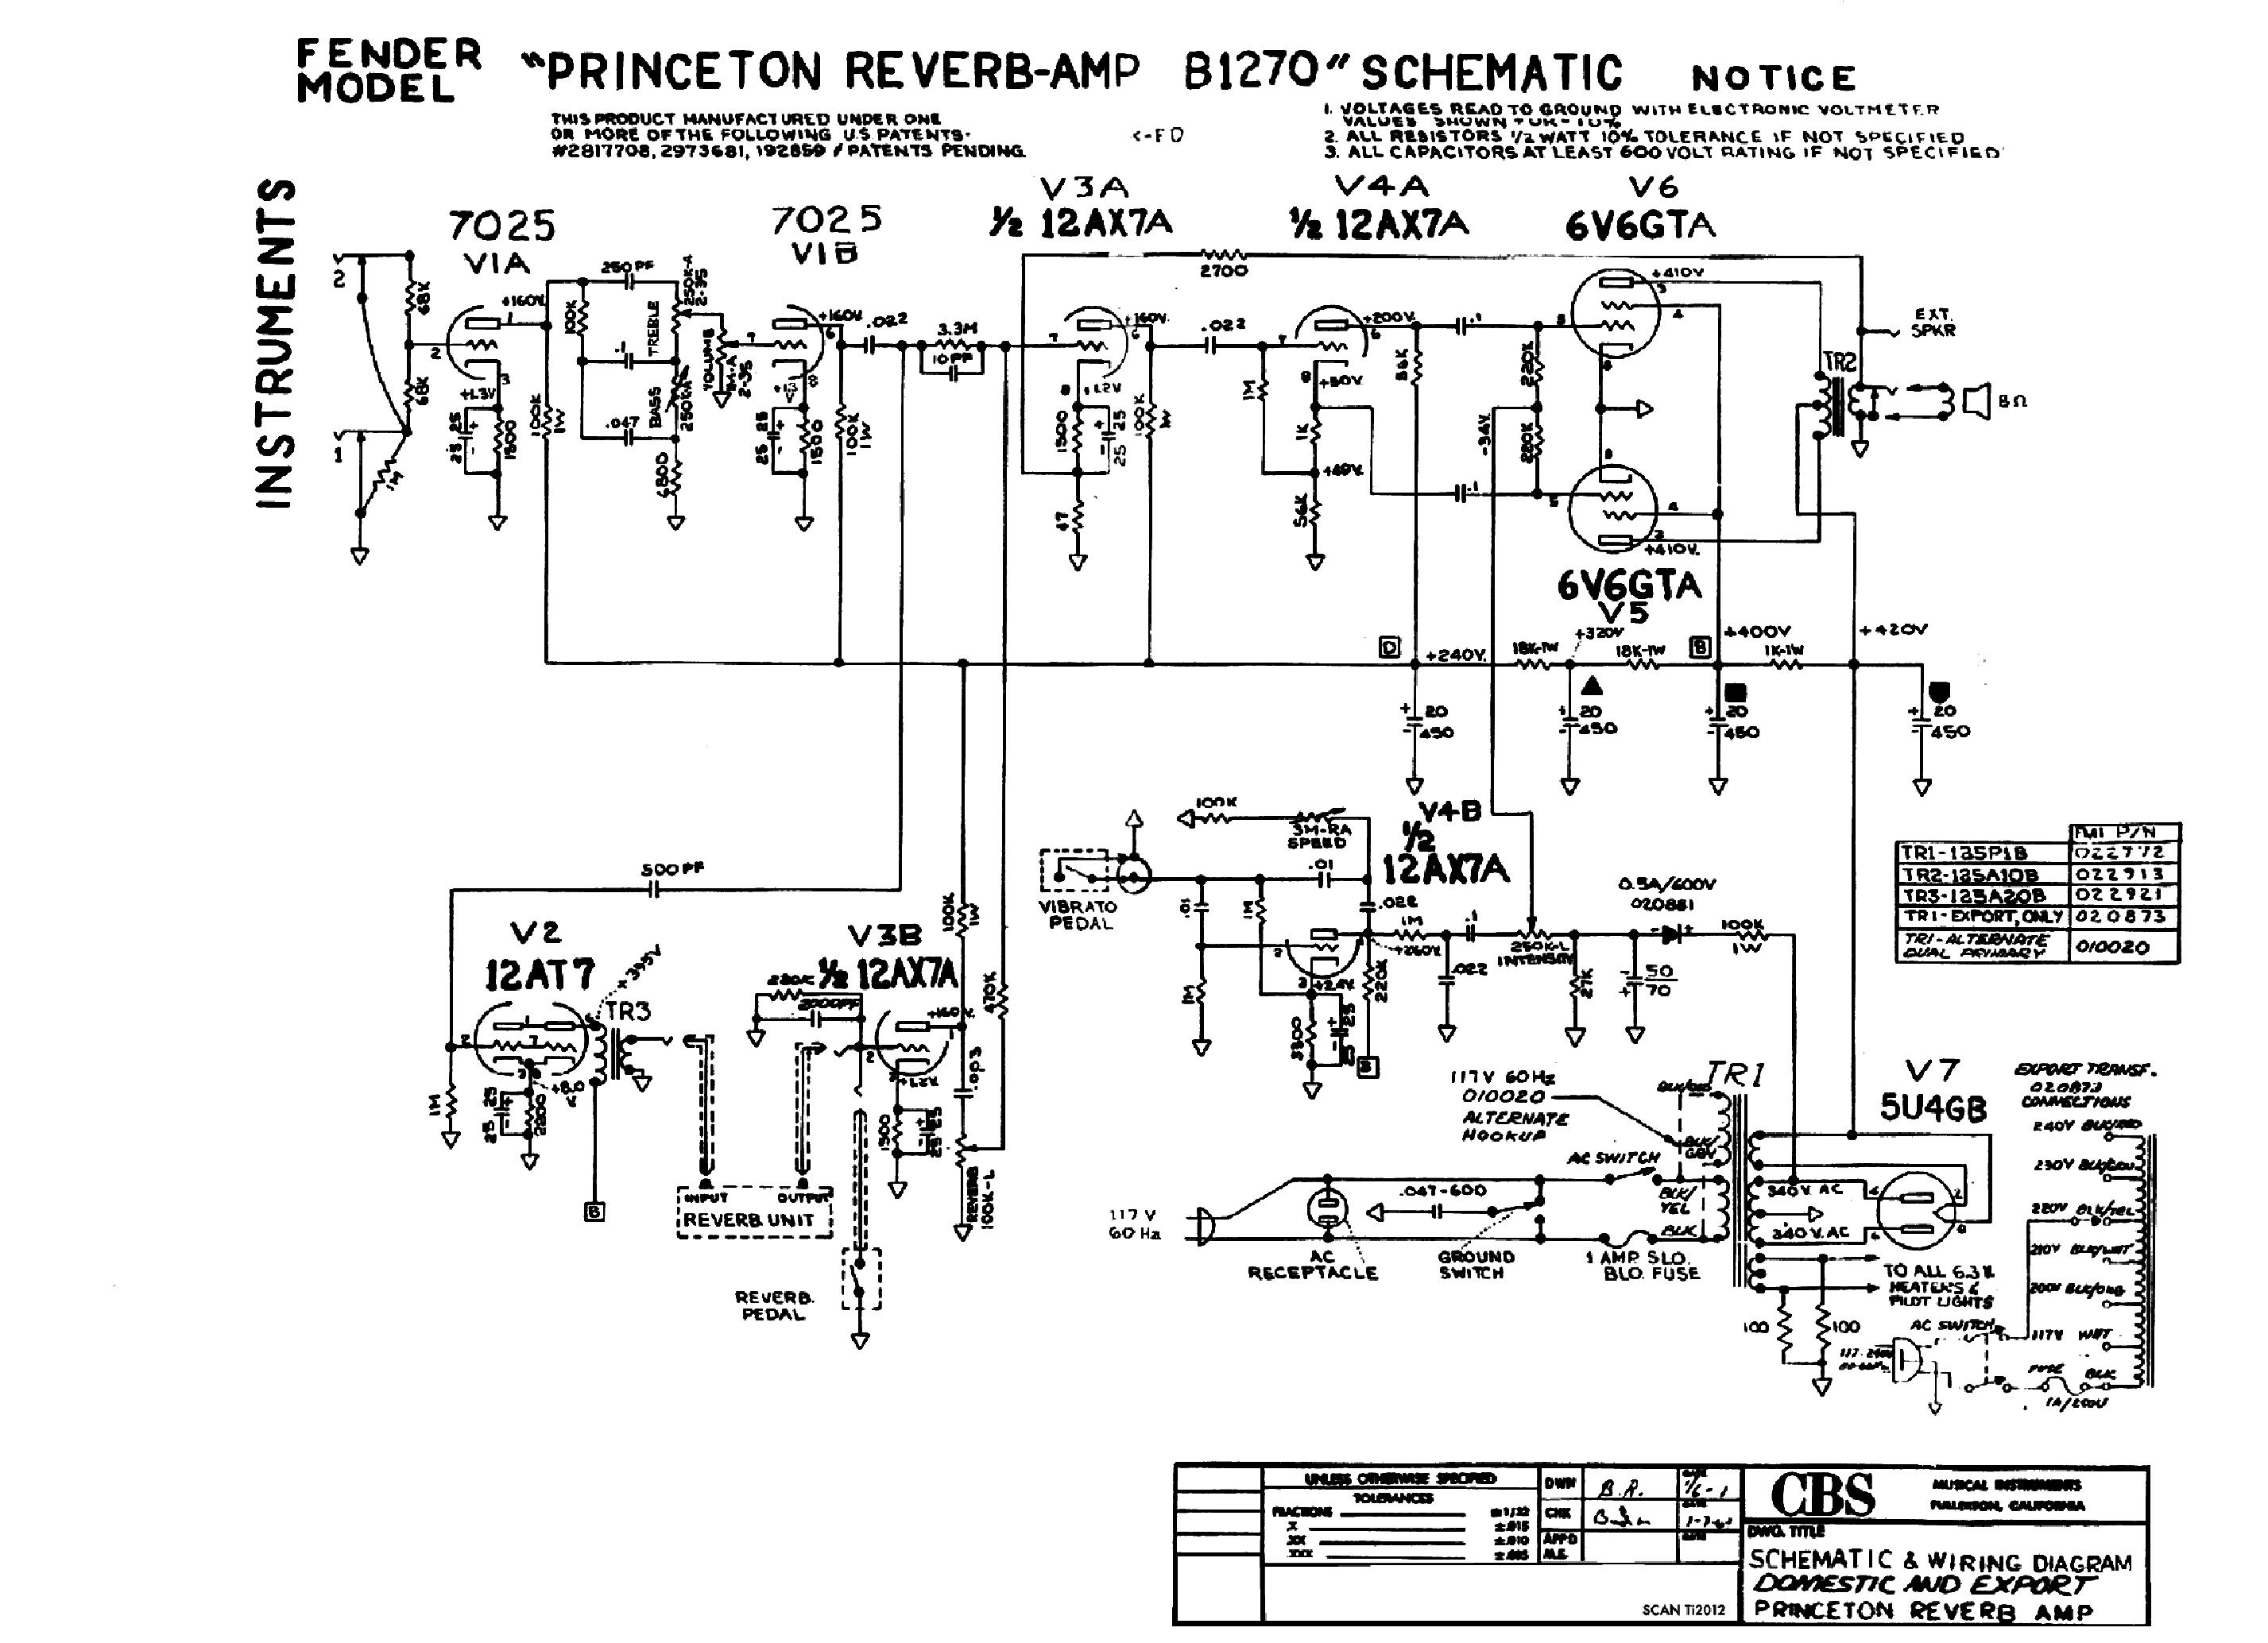 fender princeton reverb reissue schematic  | plicidi.weebly.com